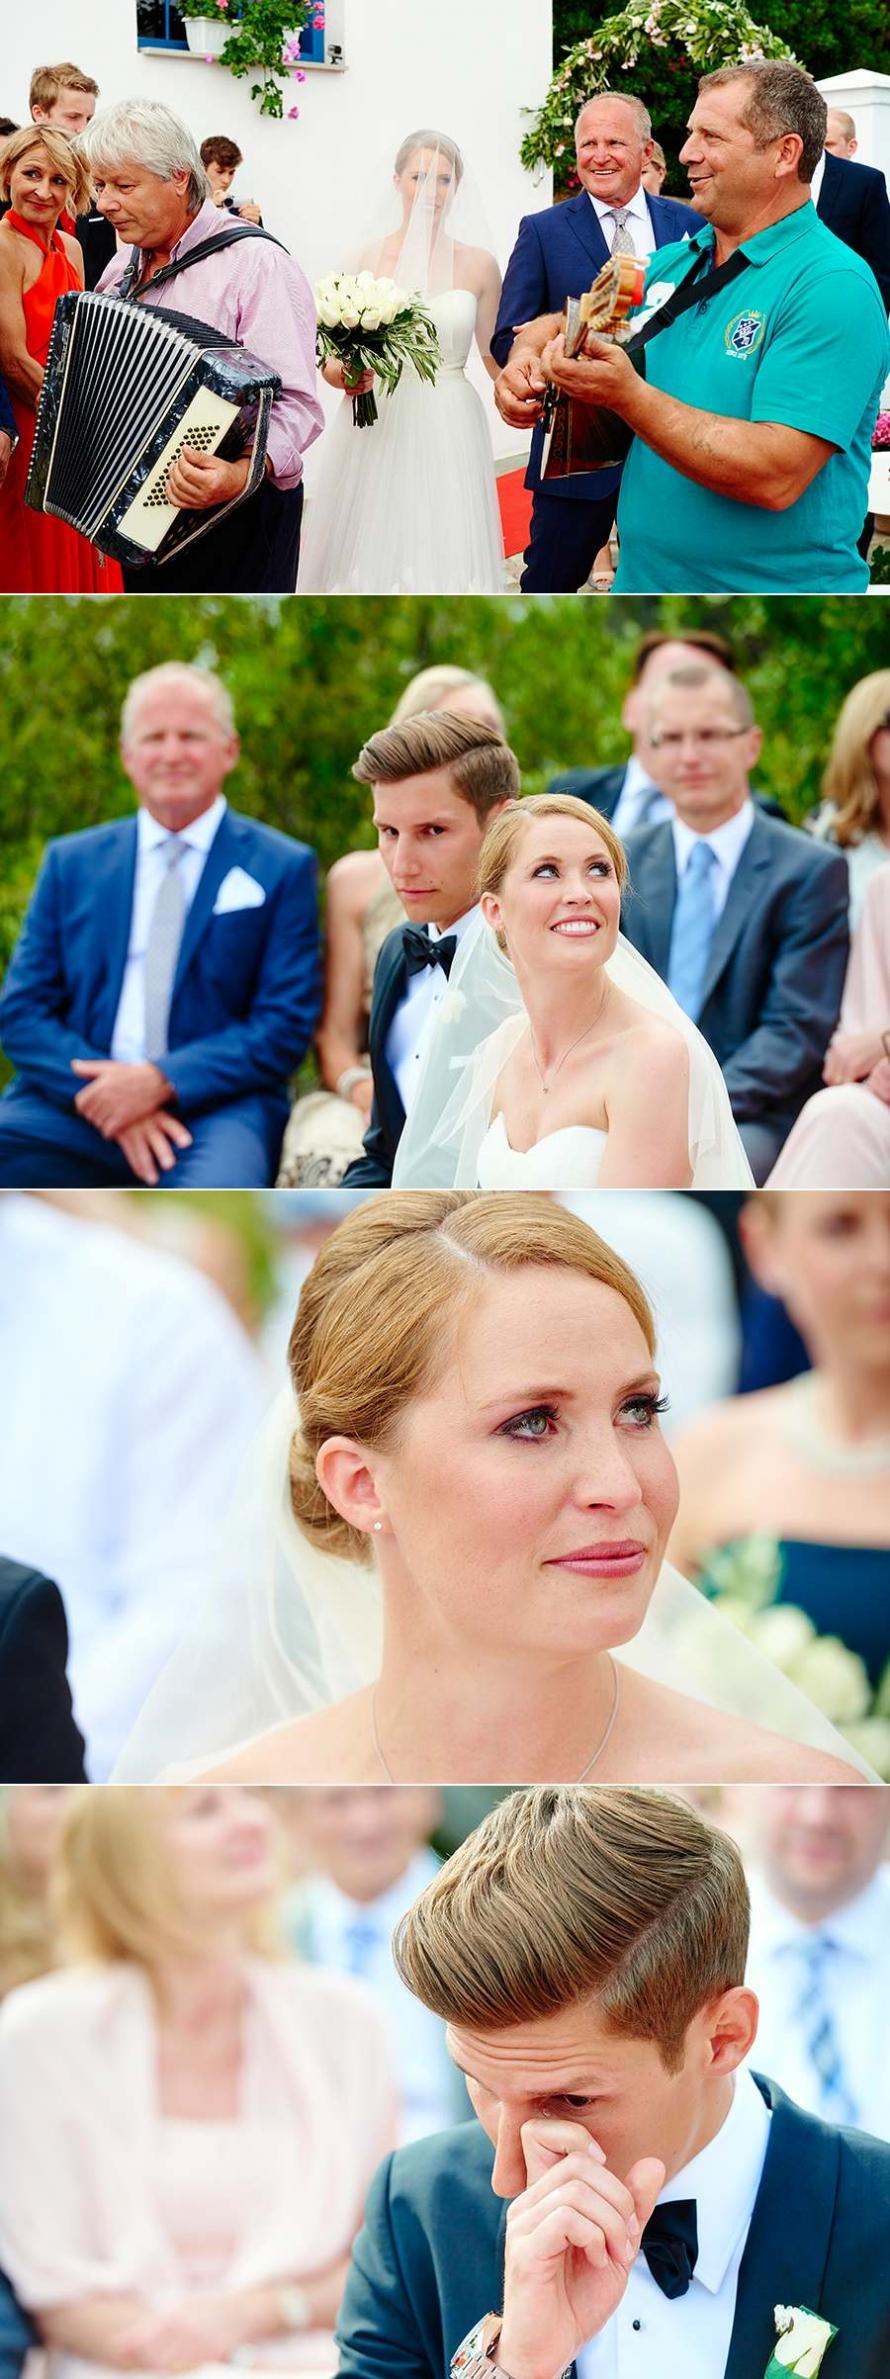 Tobi & Vanessa wedding photos 13